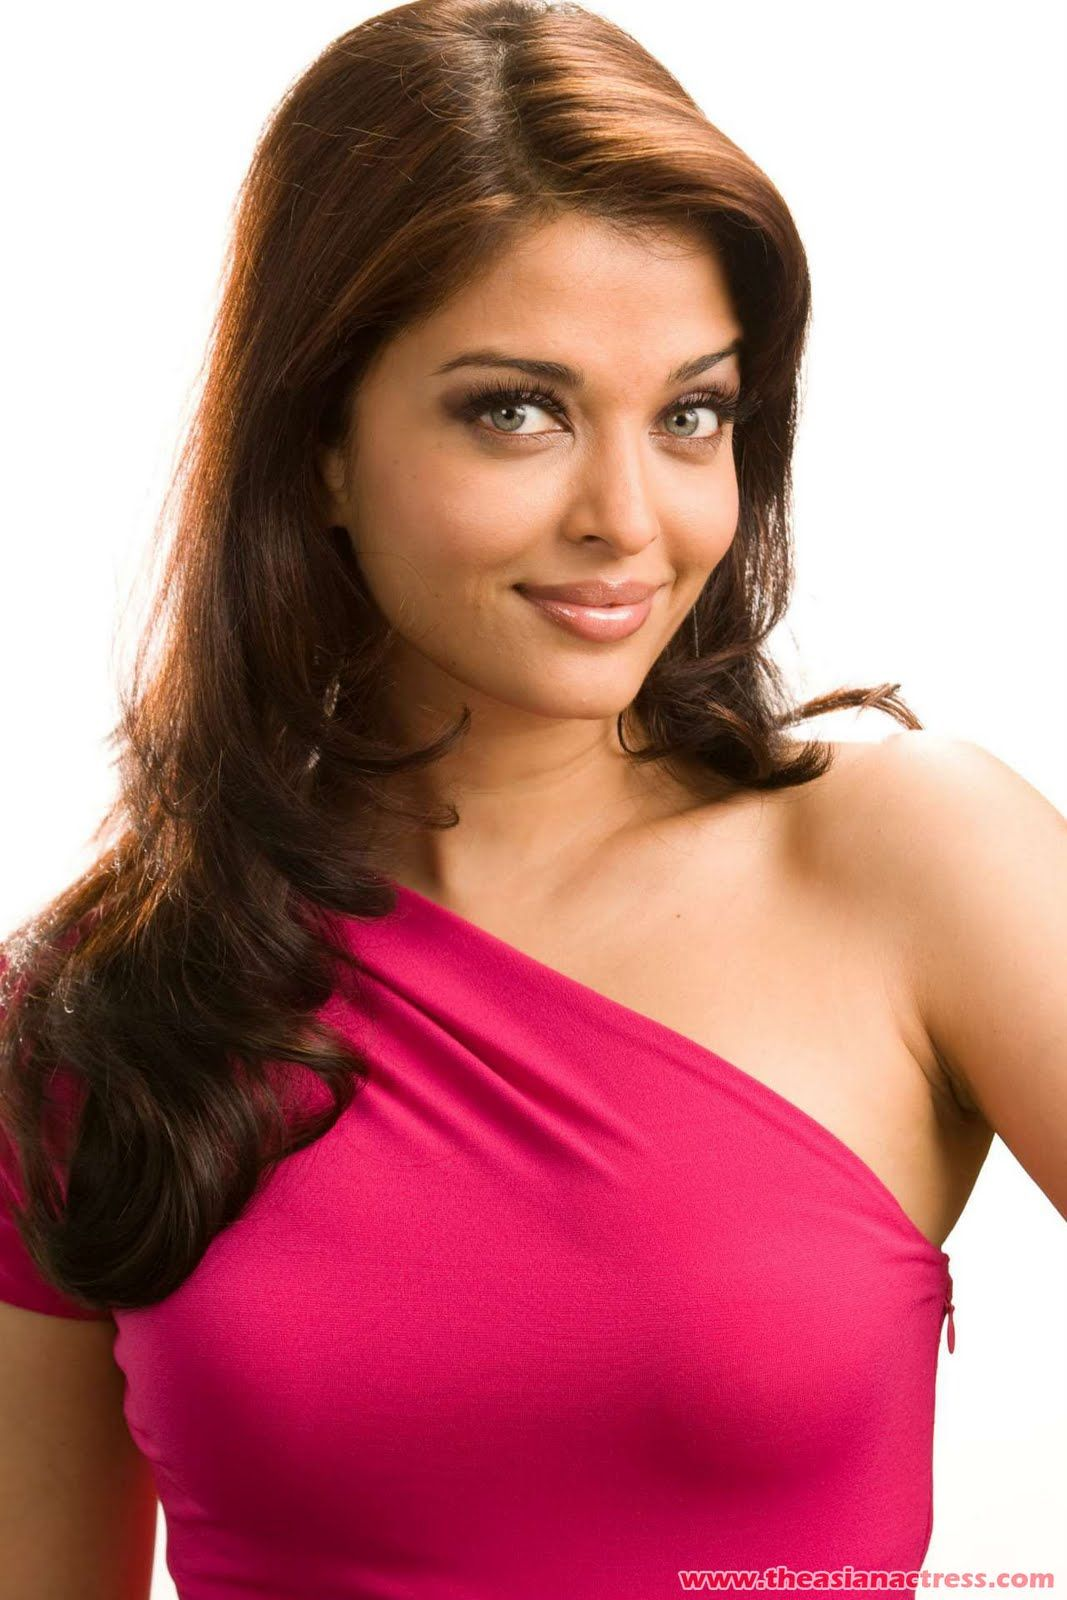 Aishwary Rai In Pink Panther 2 Promo Aishwarya Rai Zimbio Aishwarya Rai Photo Aishwarya Rai Pictures Aishwarya Rai